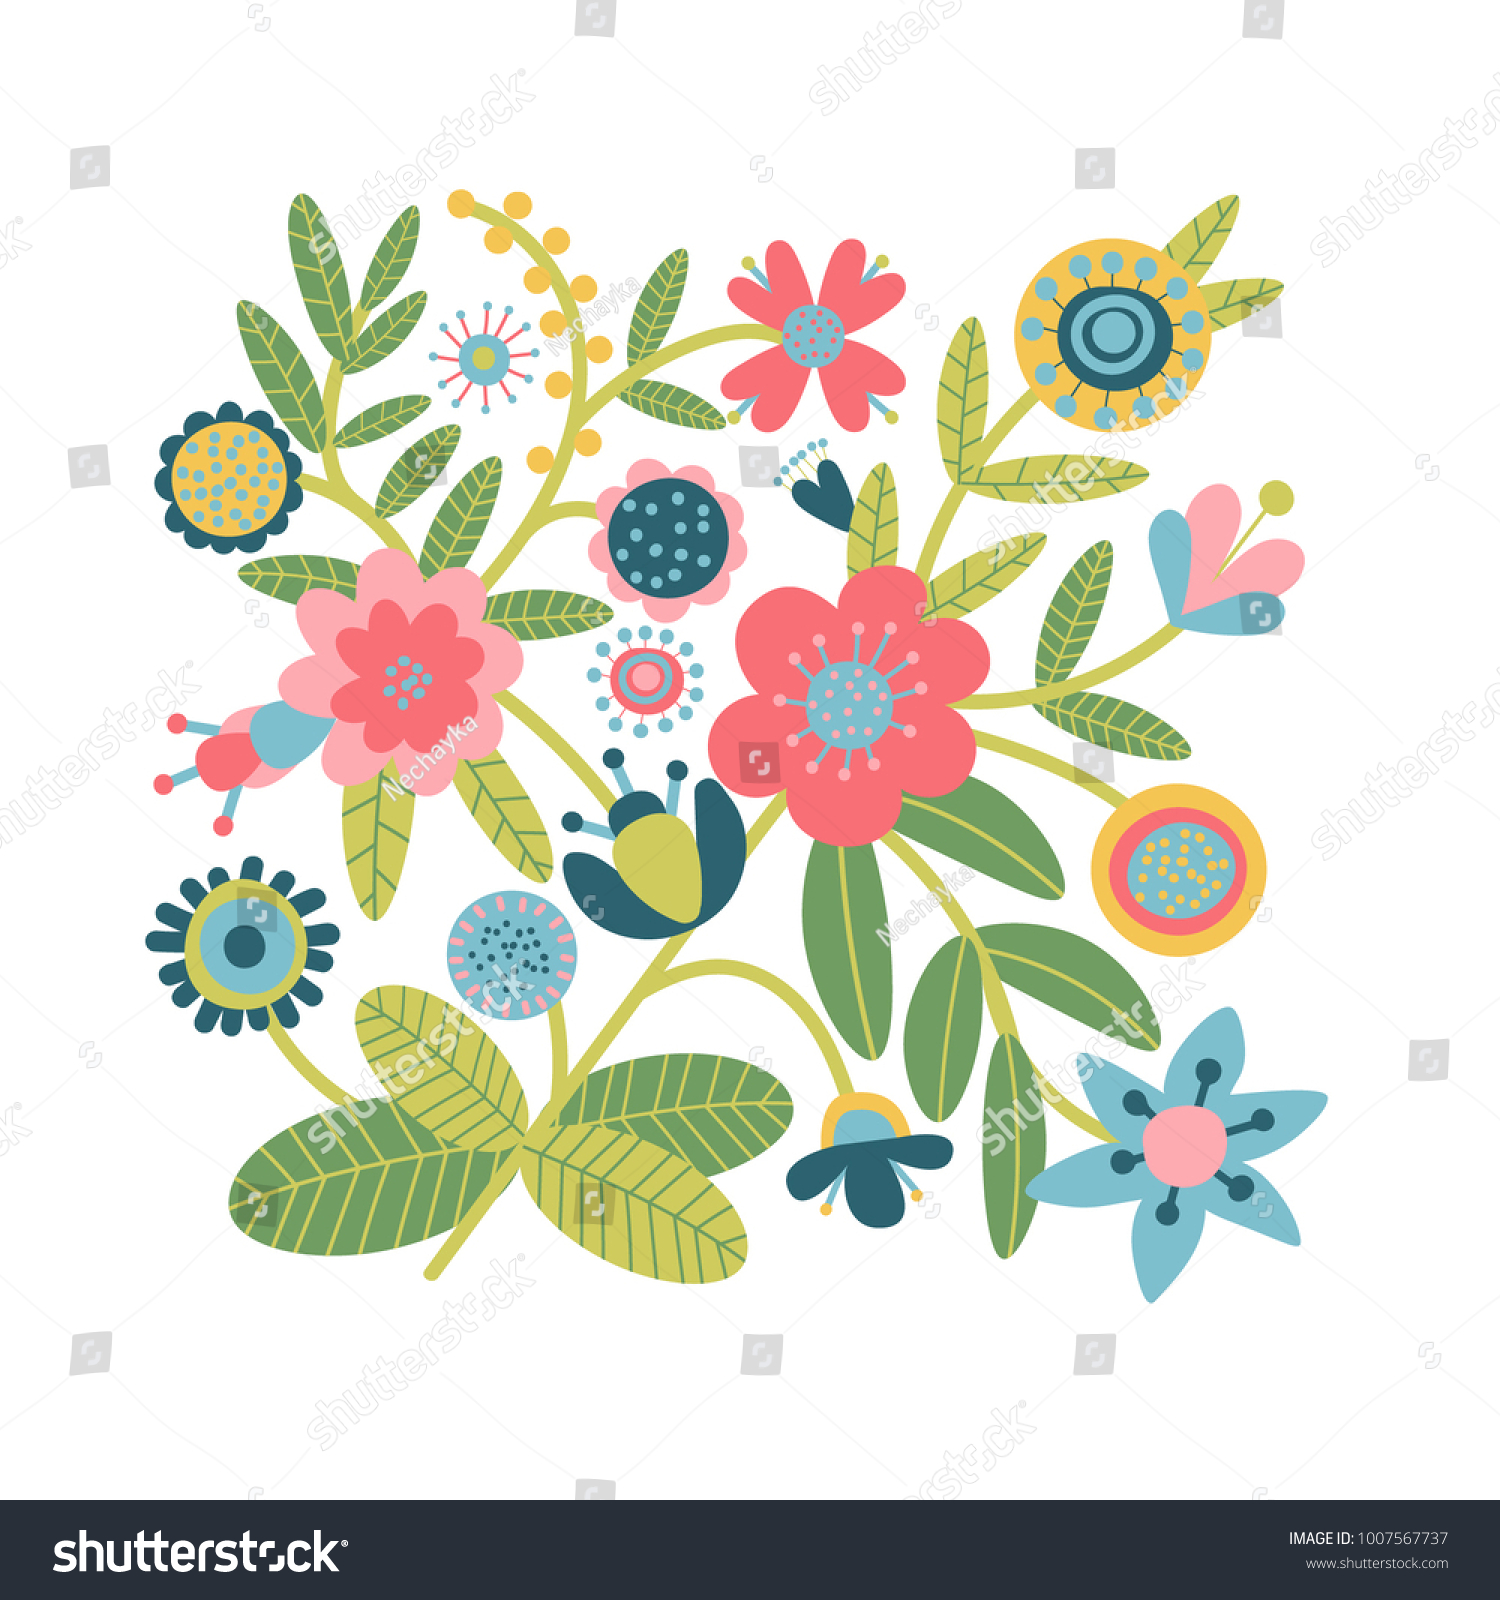 Beautiful pattern fantasy flowers flat cartoon stock vector royalty a beautiful pattern with fantasy flowers in flat cartoon style folk or tribal design izmirmasajfo